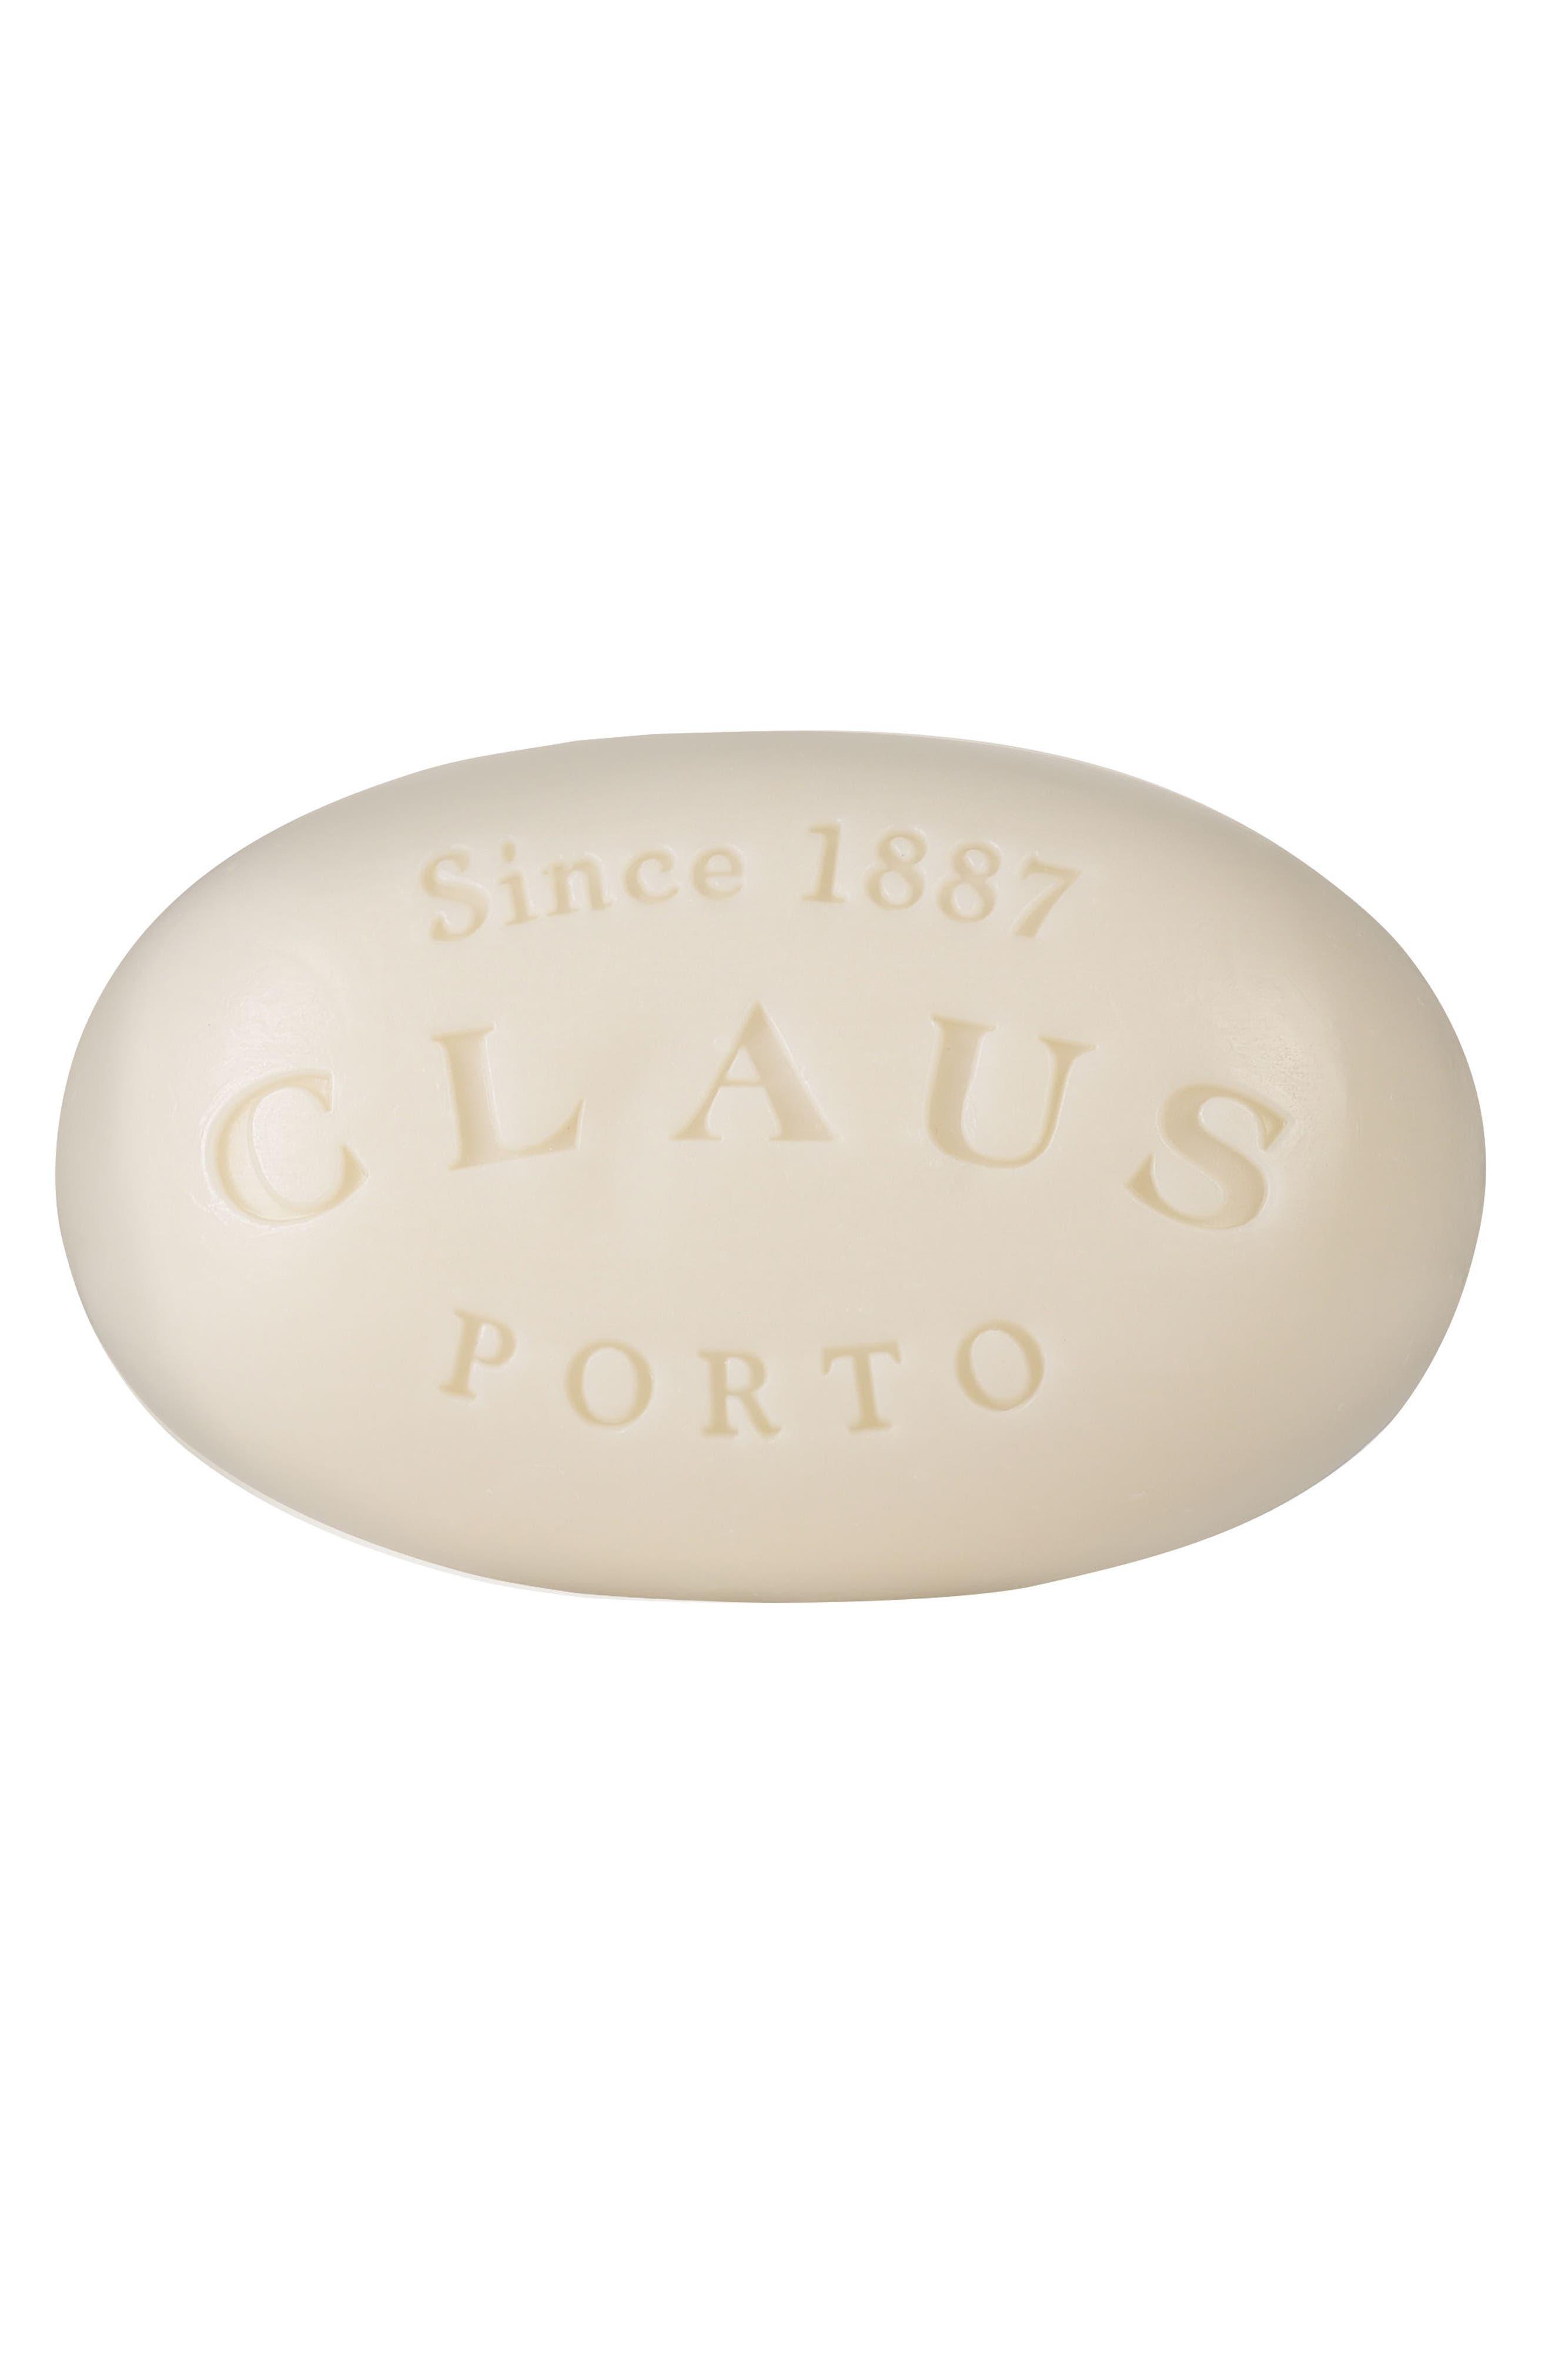 Main Image - Claus Porto Voga Acacia Tuberose Soap